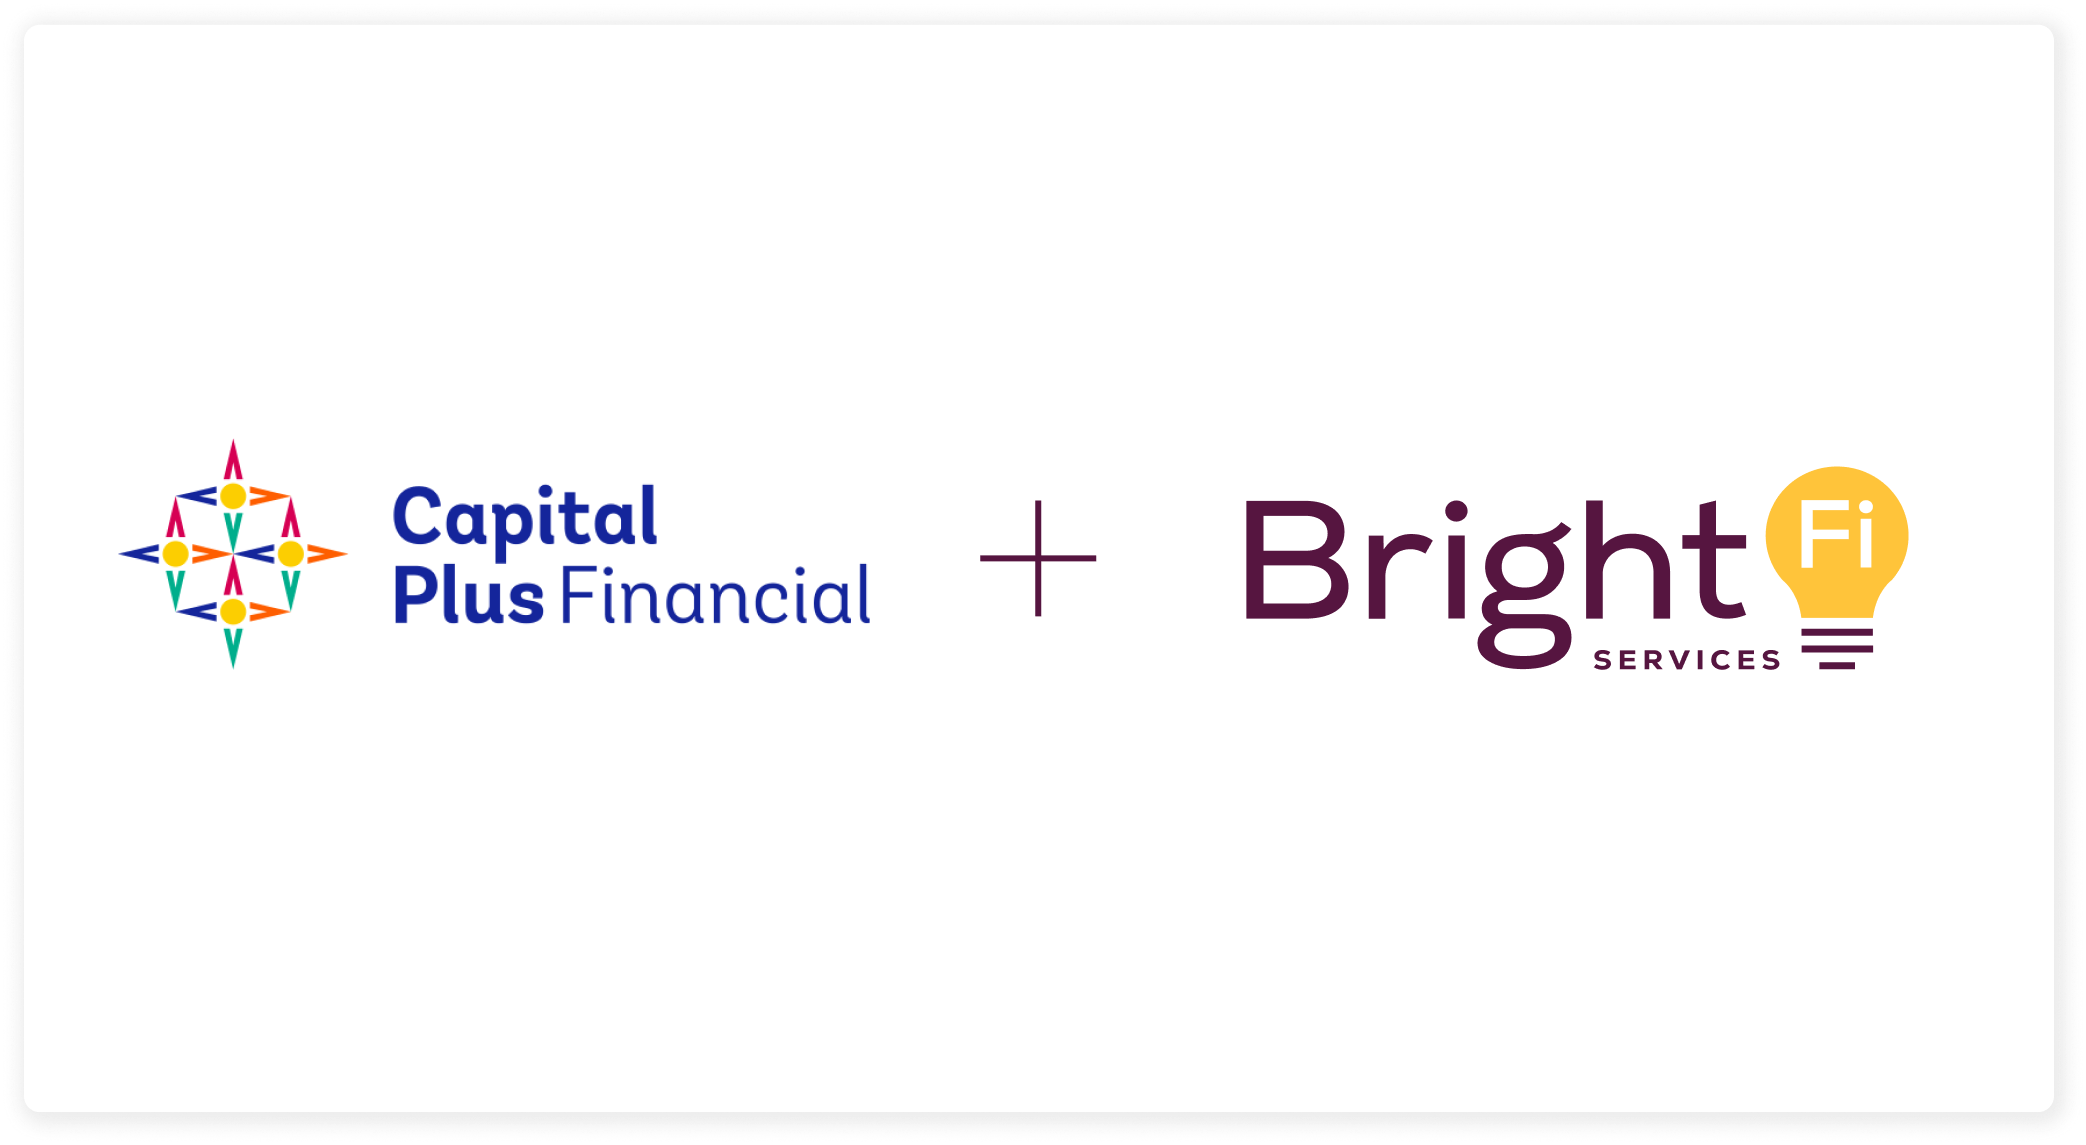 The BankOn logo and the BrightFi logo on a white background